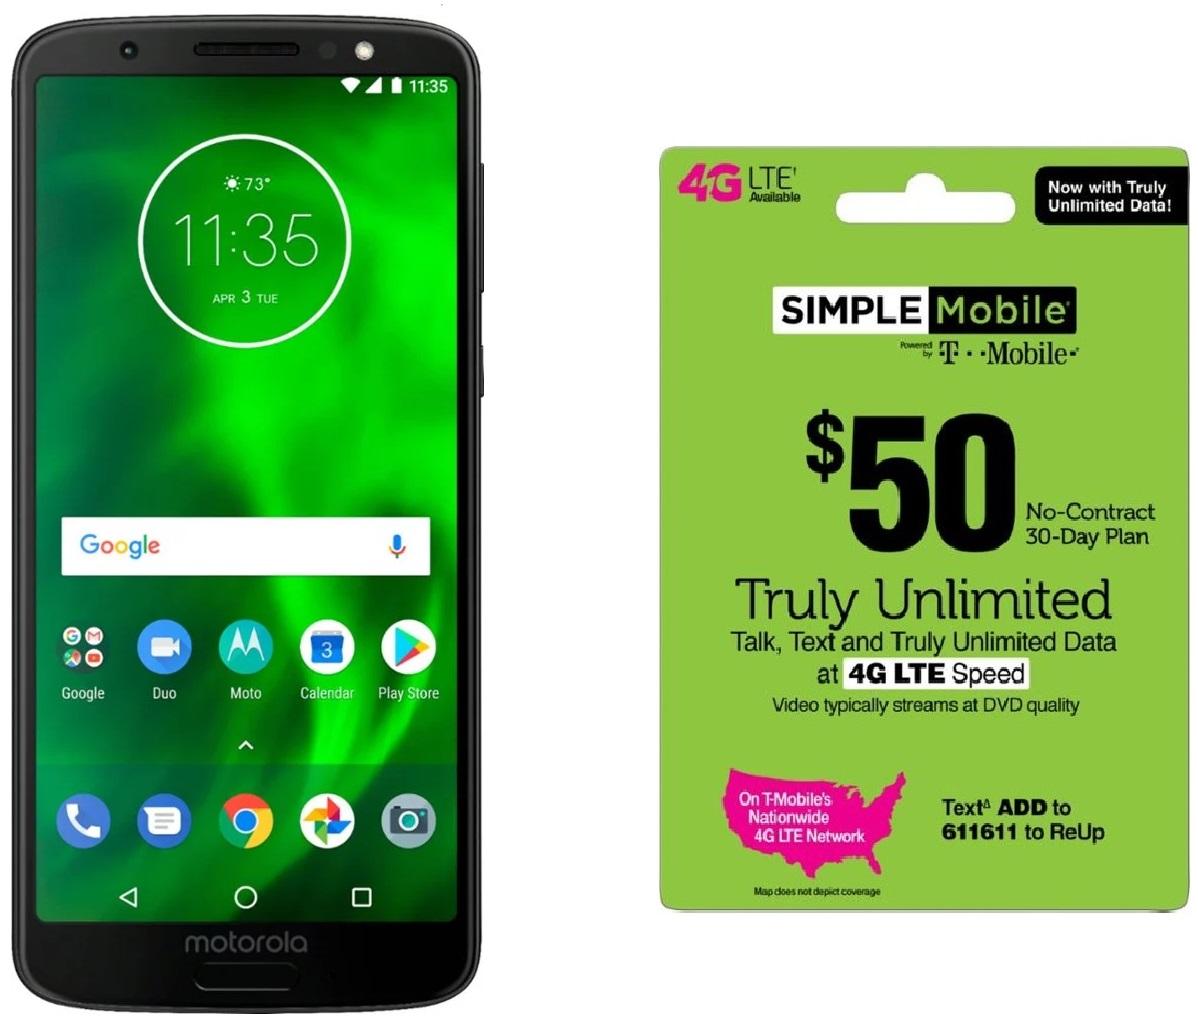 32GB Motorola Moto G6 (Unlocked) + $50 Simple Mobile Prepaid Card